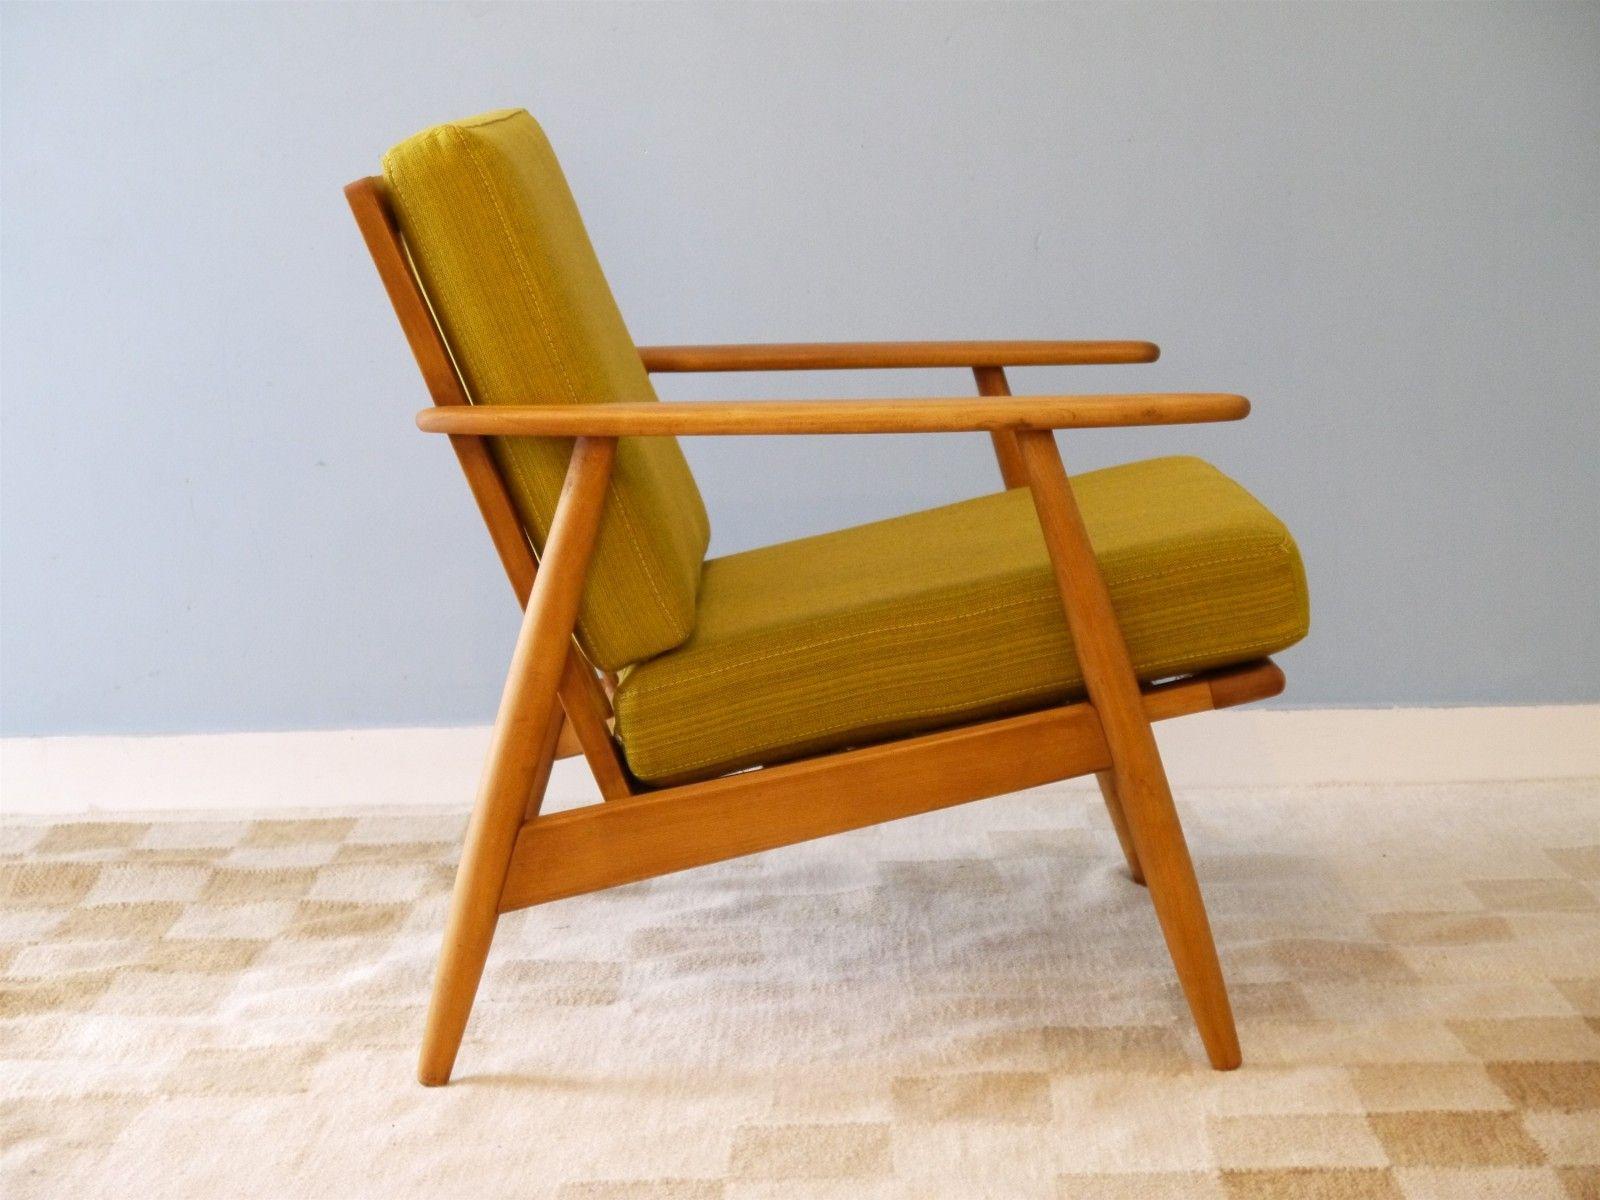 fauteuil jaune moutarde en htre danemark 1960s - Fauteuil Scandinave Moutarde